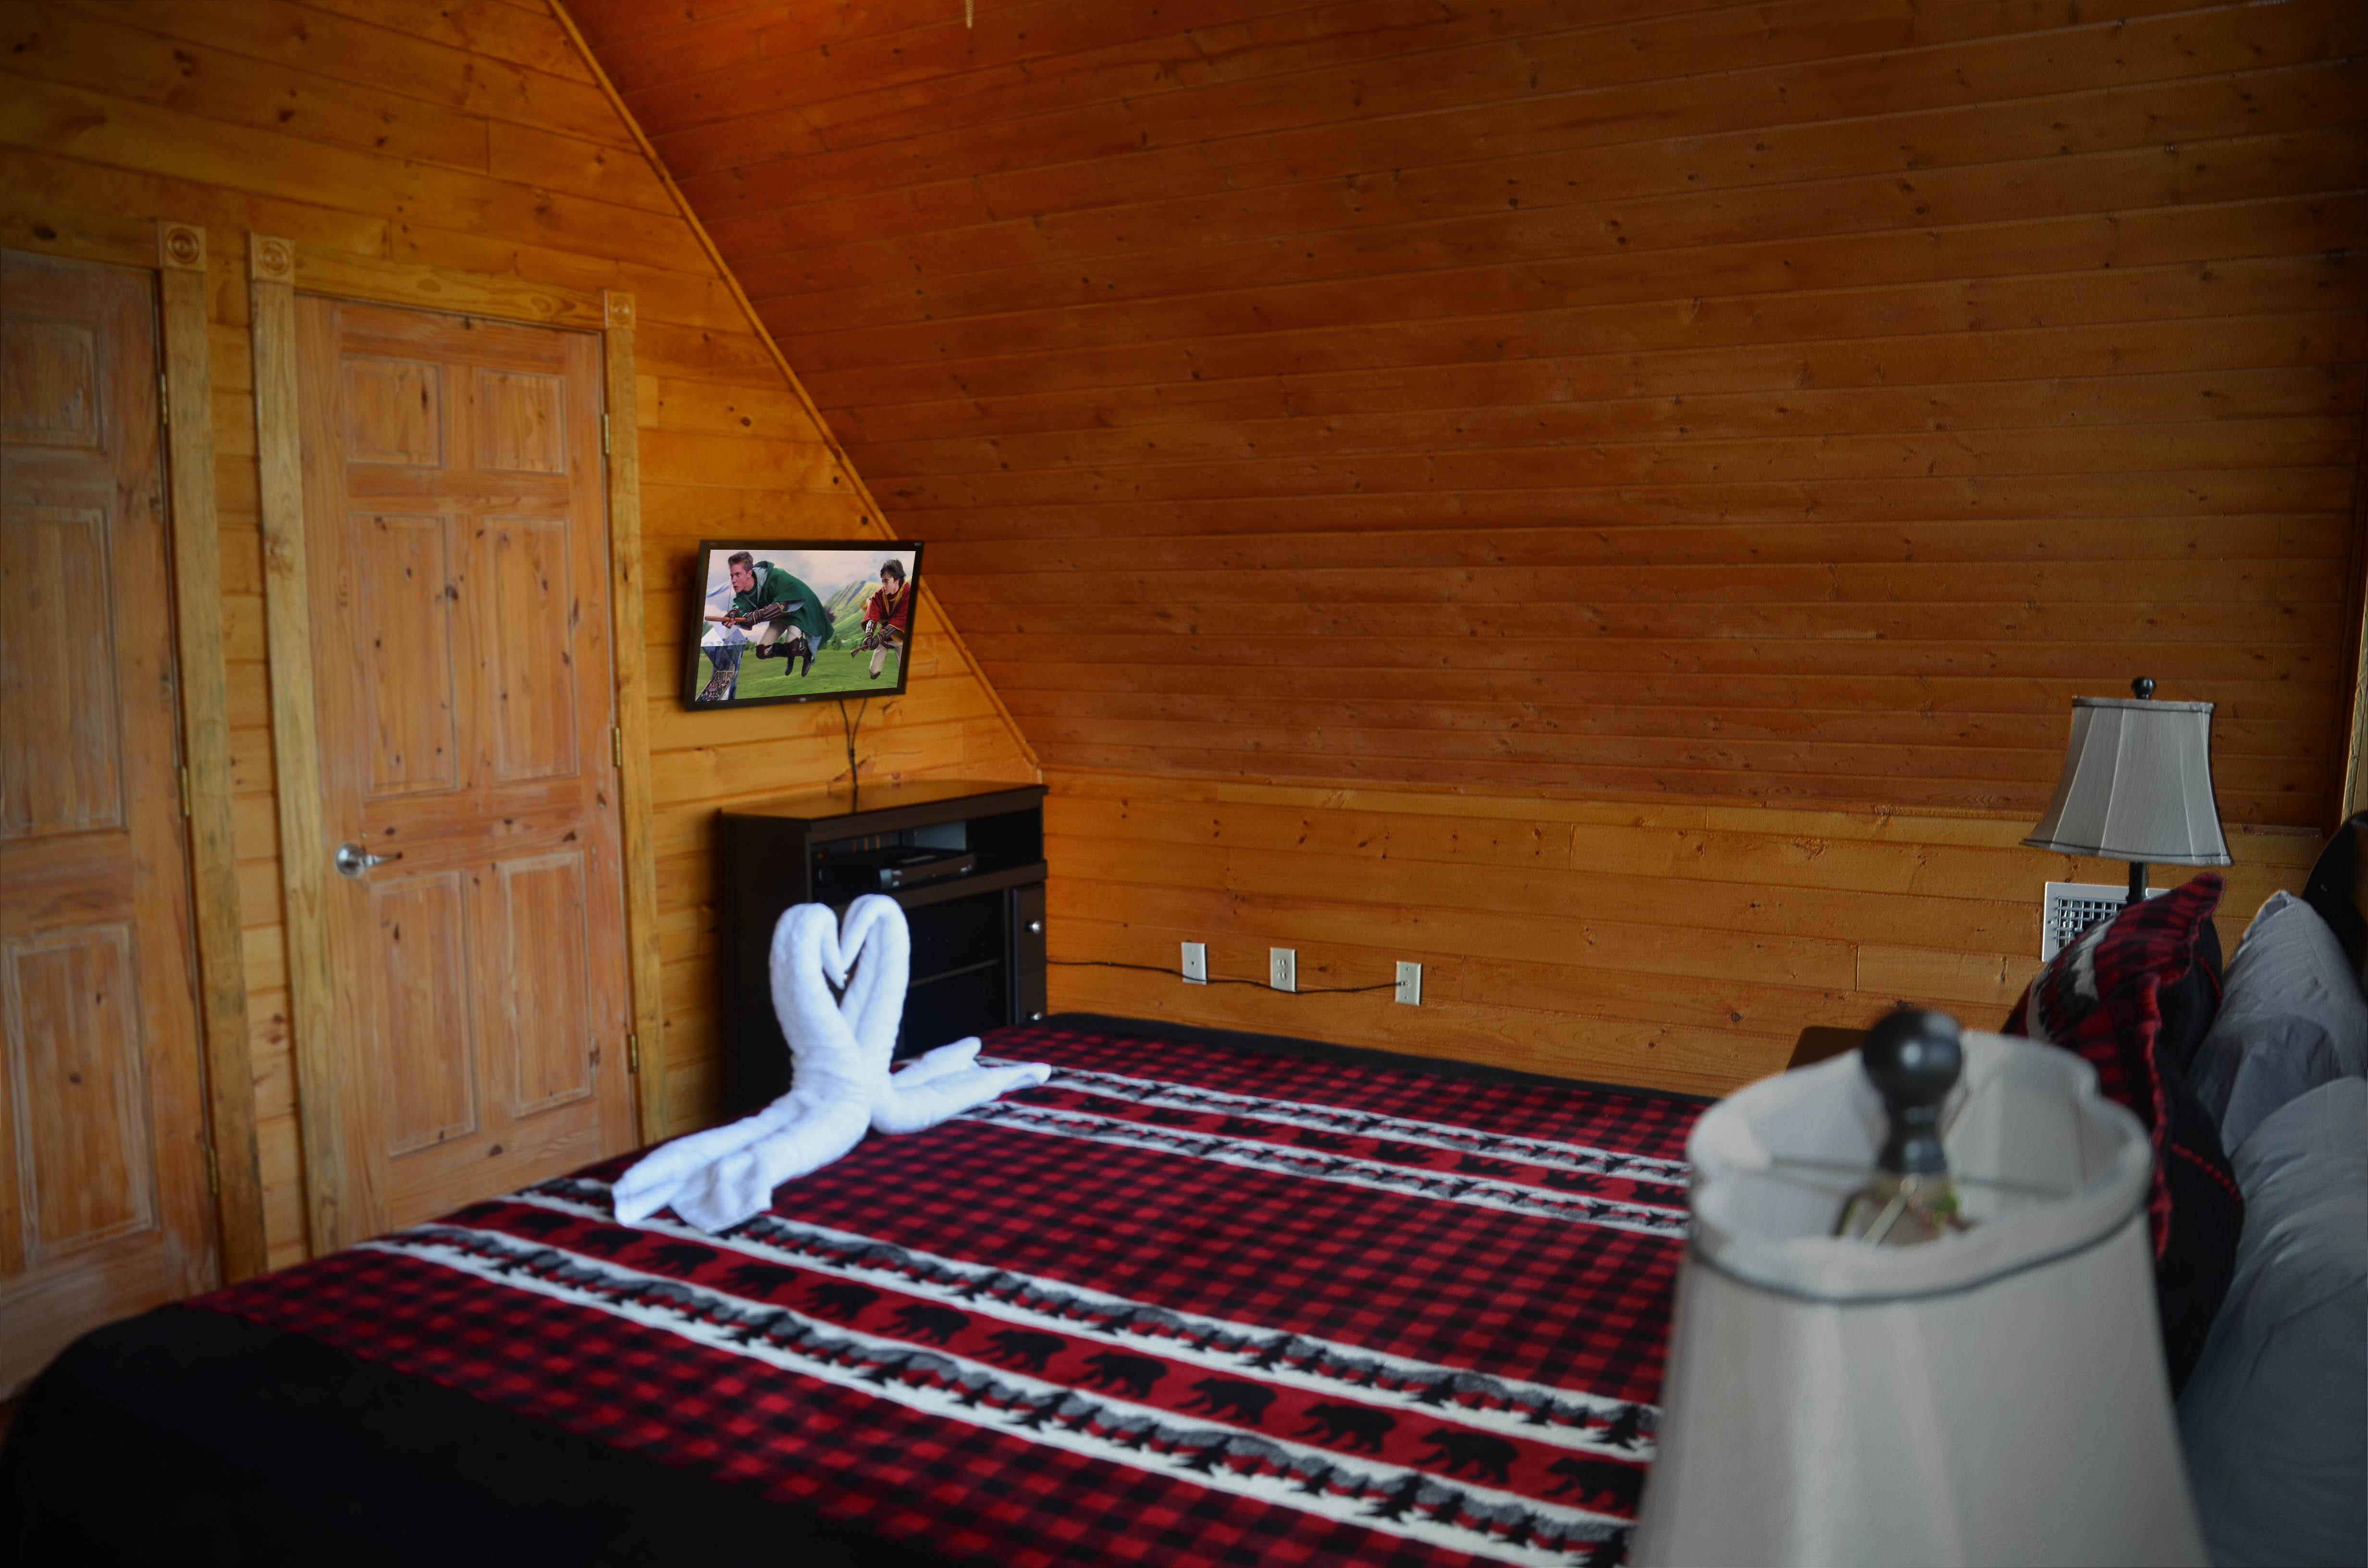 Pigeon Forge Cabin River 39 S Edge Retreat 5 Bedroom Sleeps 18